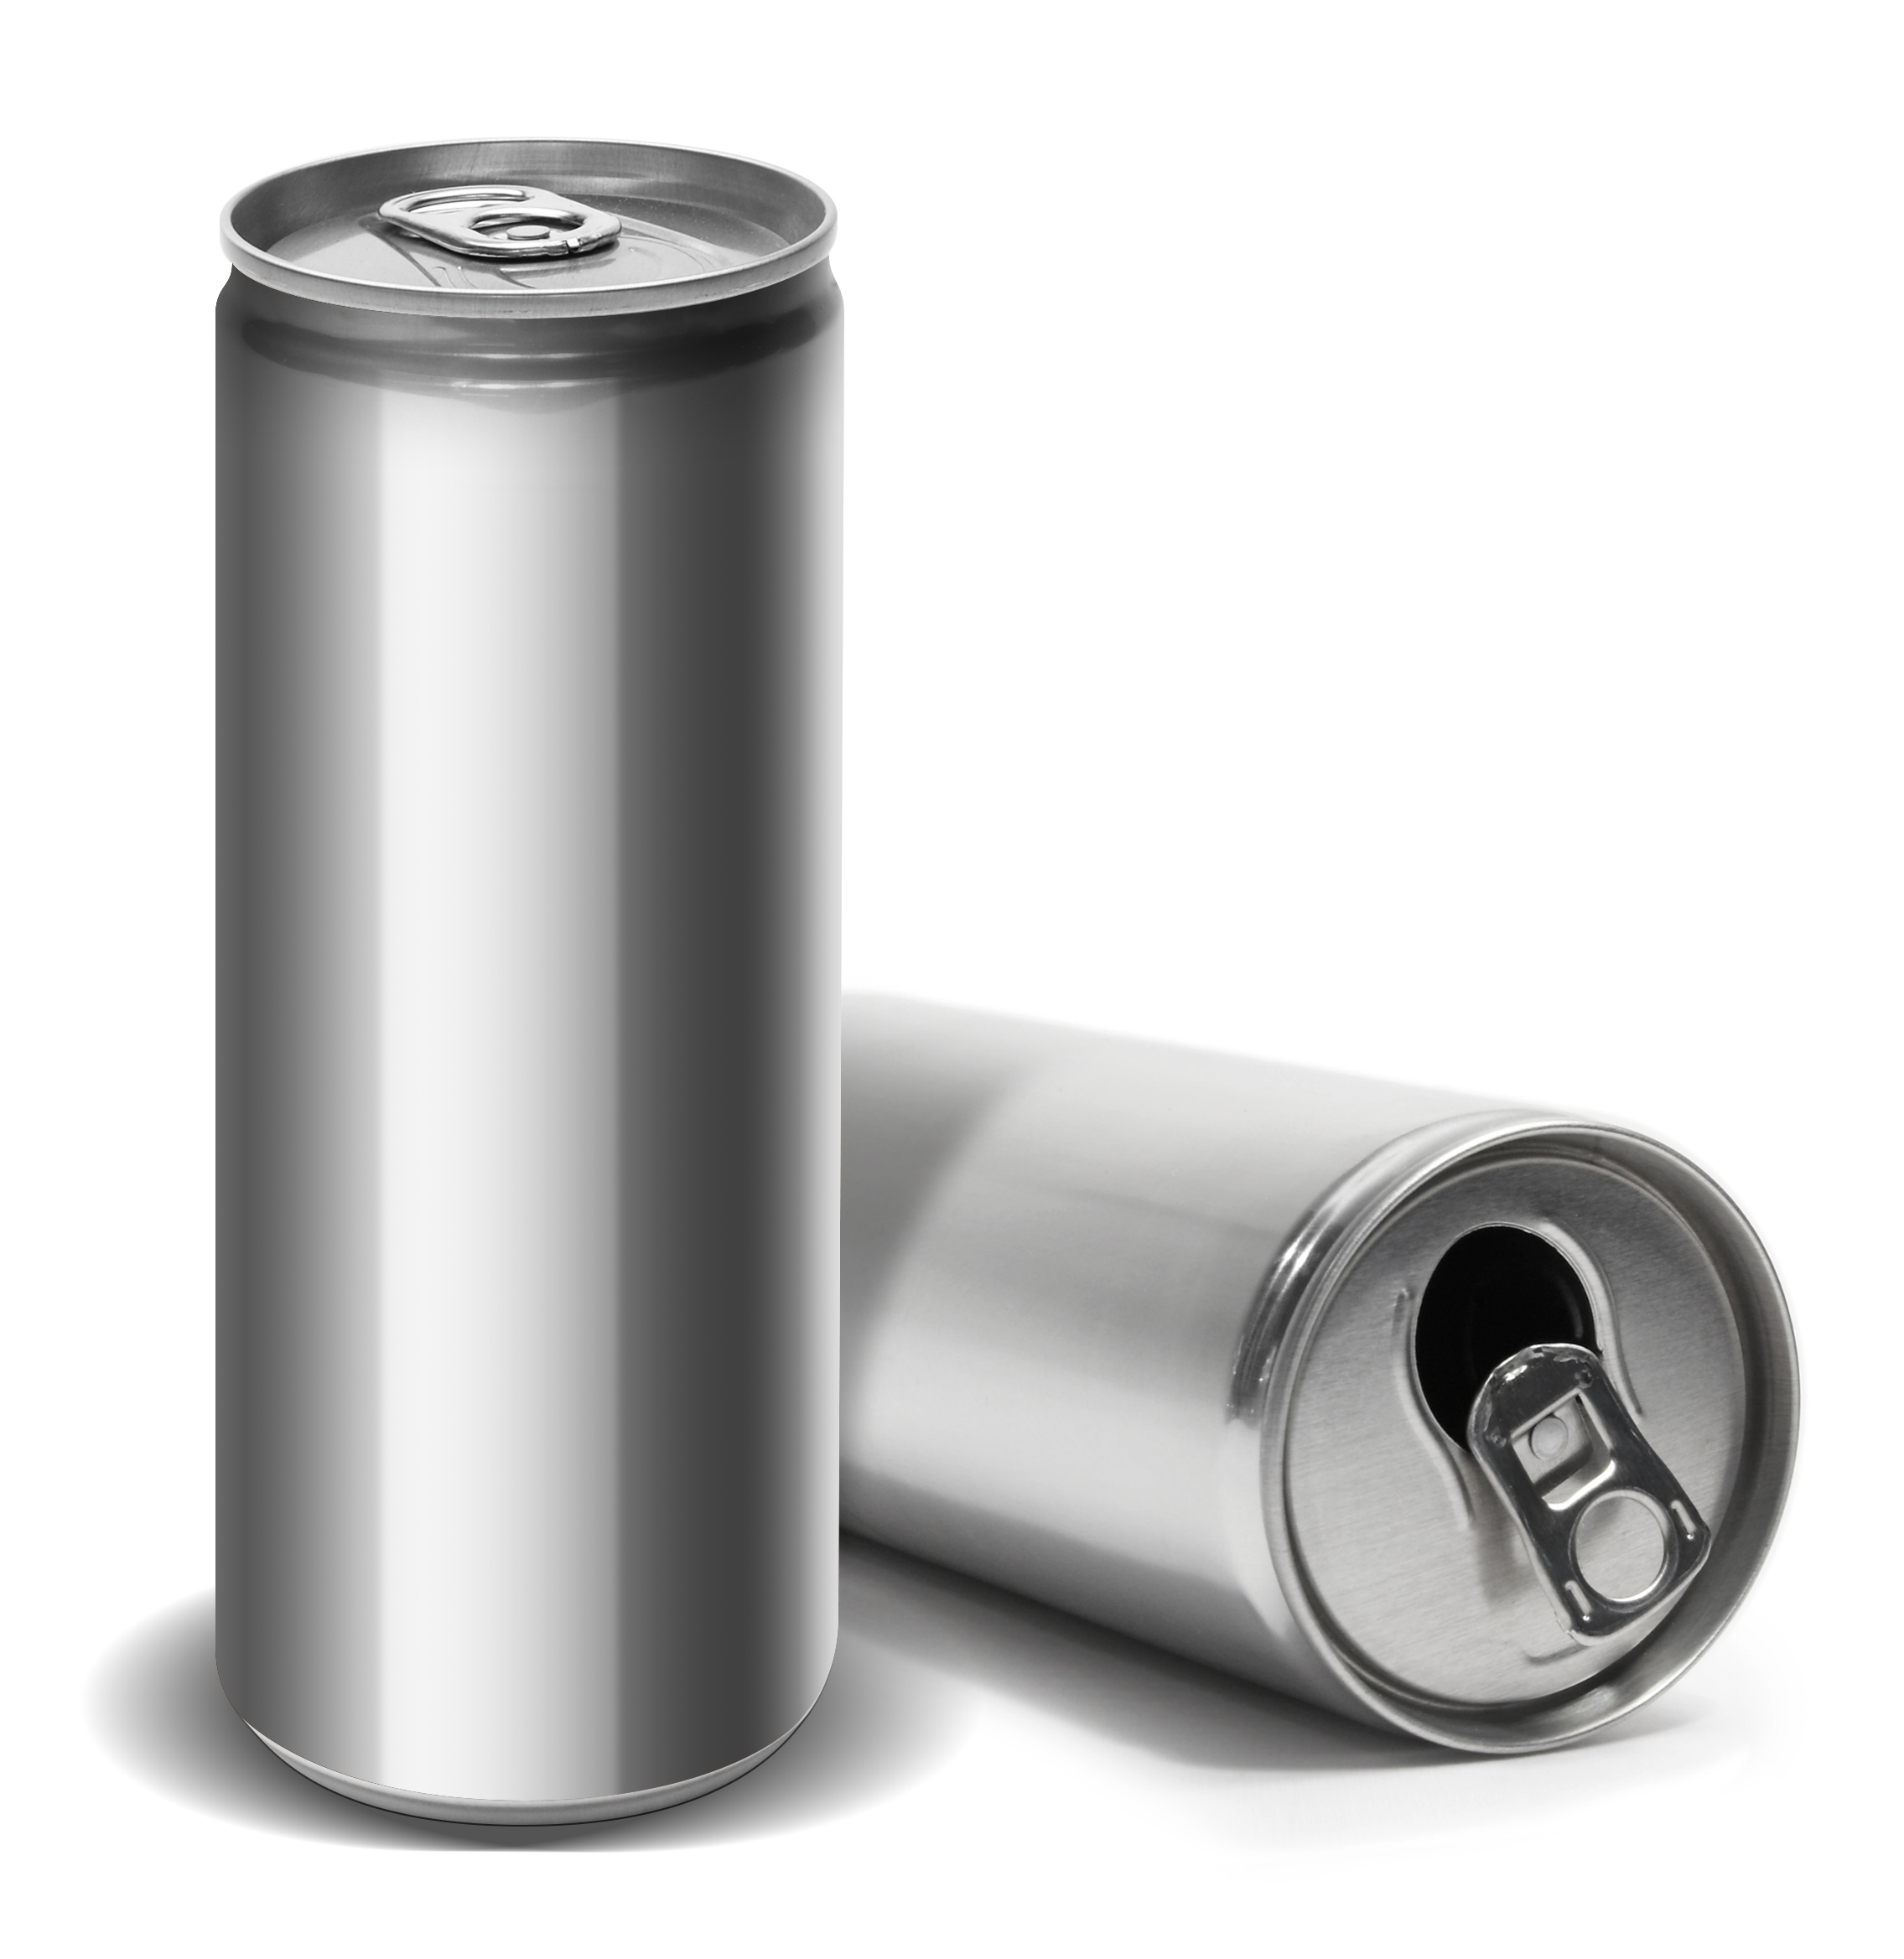 Visy's slim cans